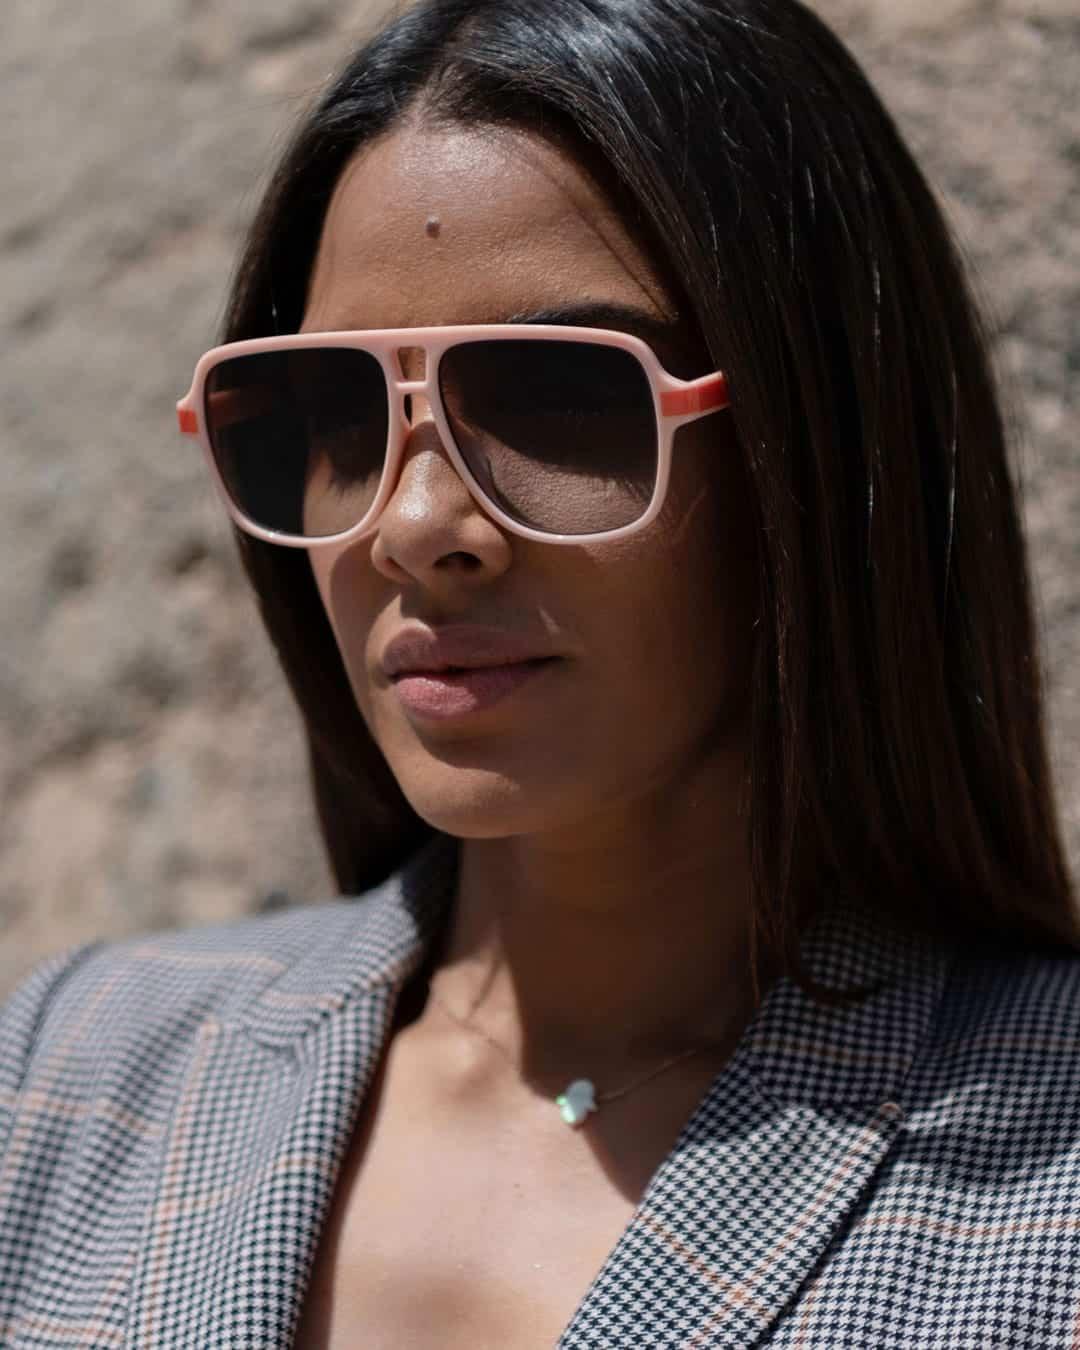 Pink aviator sunglasses on a woman